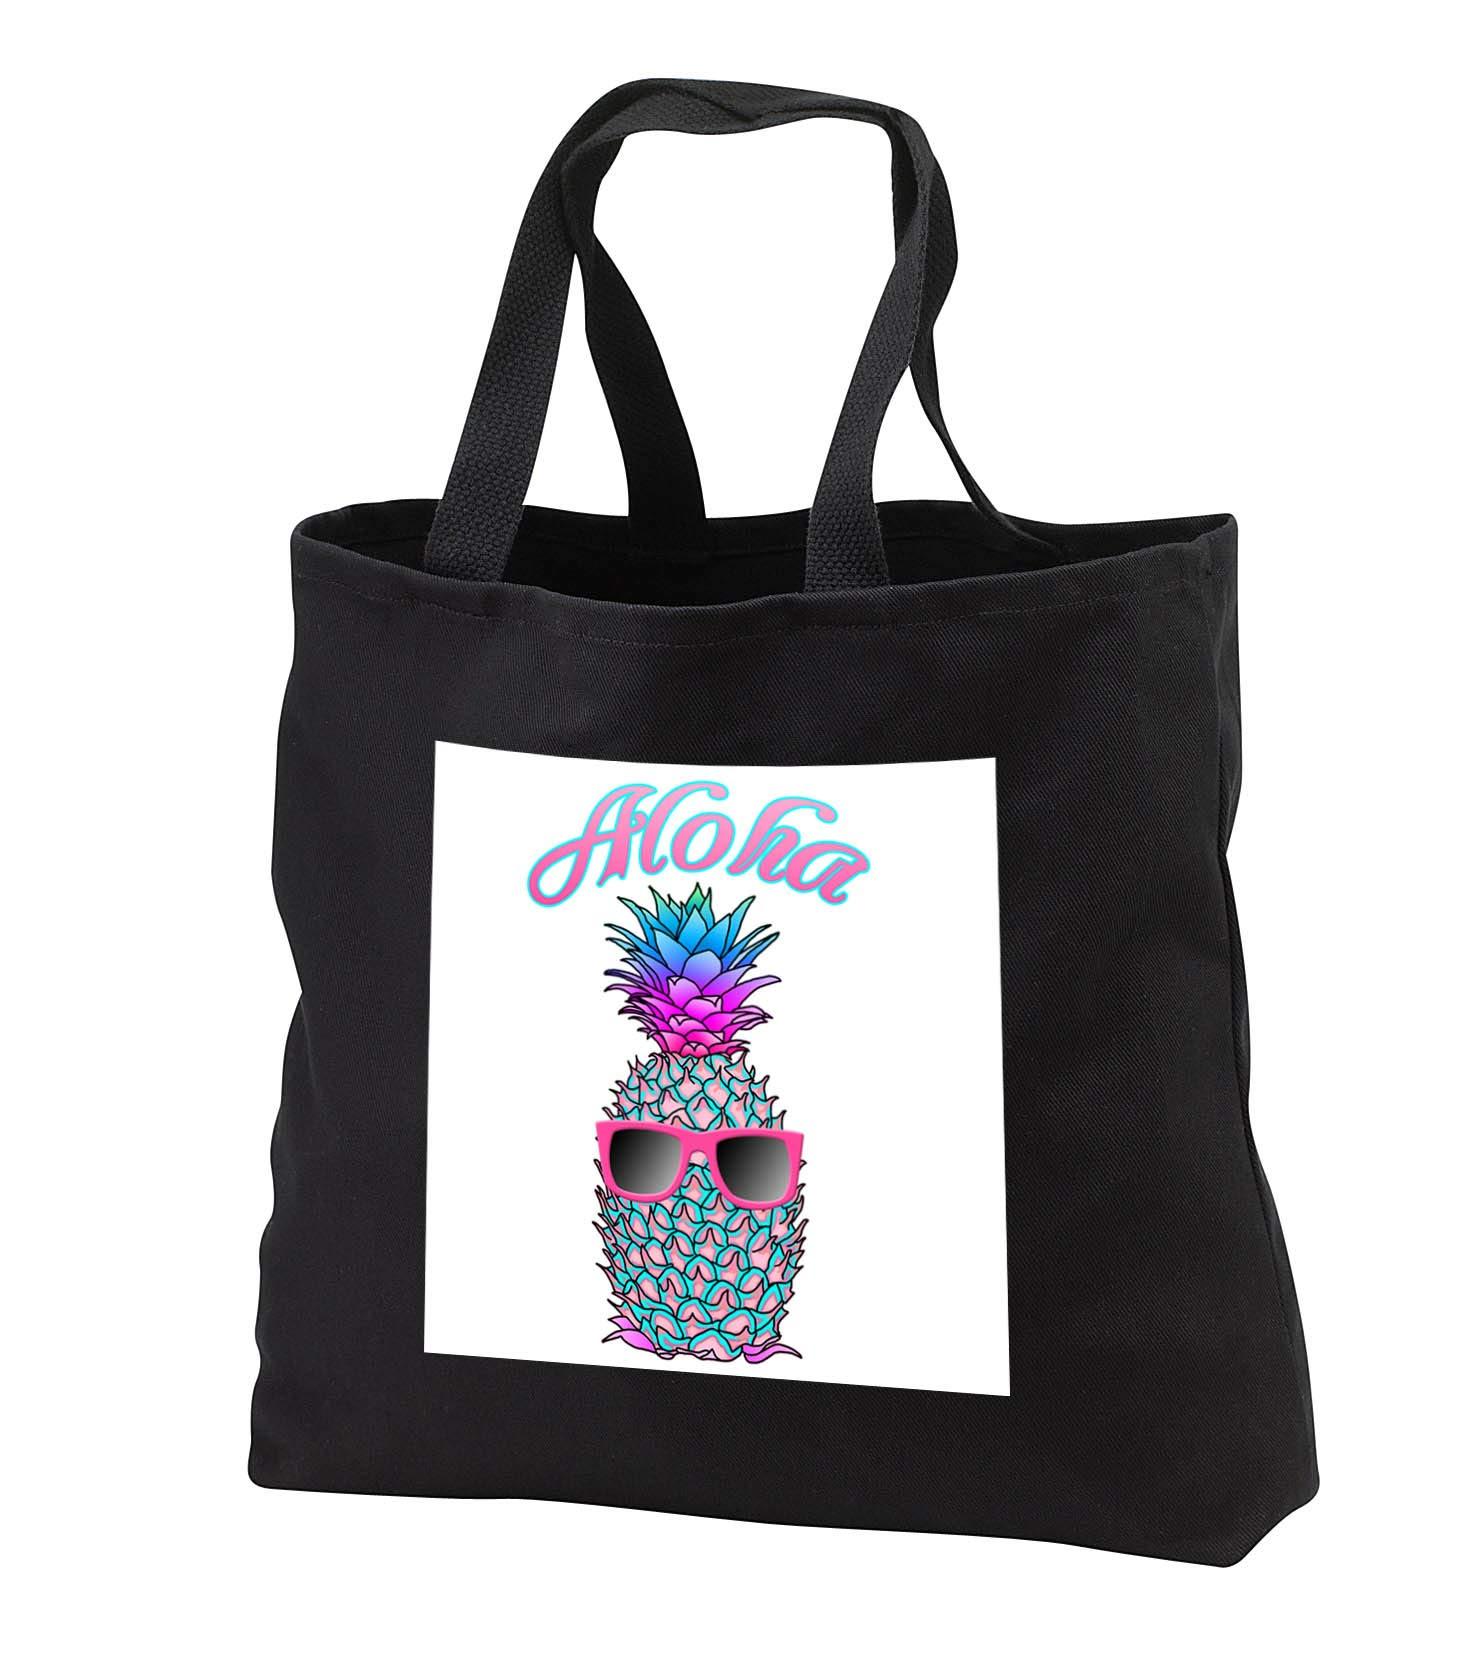 MacDonald Creative Studios - Hawaii - Aloha Hawaiian design with a cool tropical pineapple in sunglasses. - Tote Bags - Black Tote Bag JUMBO 20w x 15h x 5d (tb_291826_3)